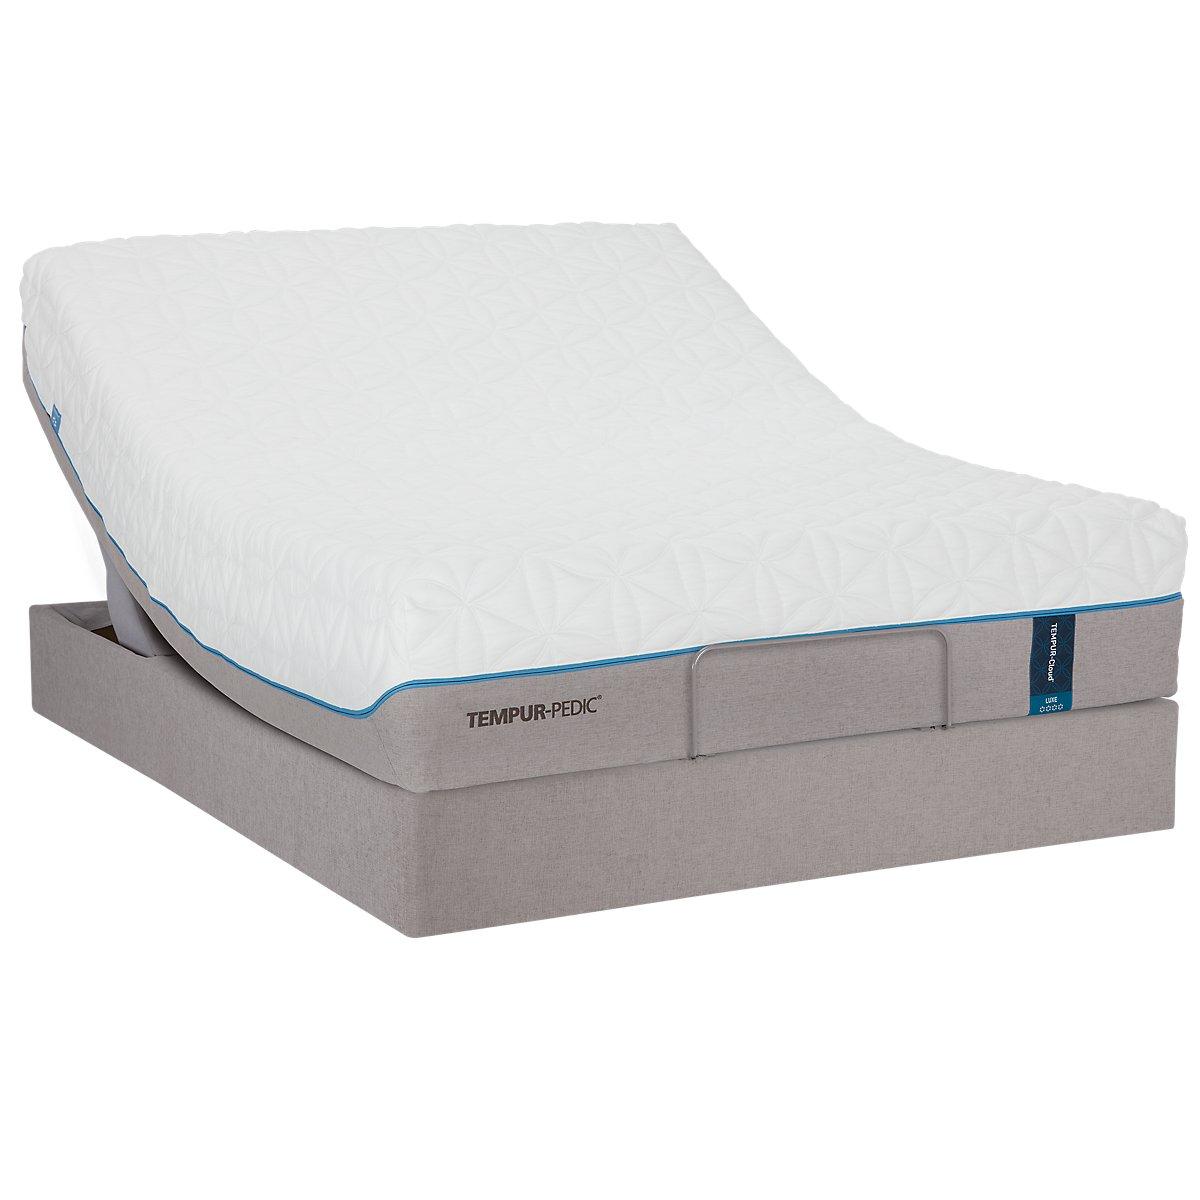 Adjustable Beds With Financing : City furniture tempur cloud? luxe premier adjustable